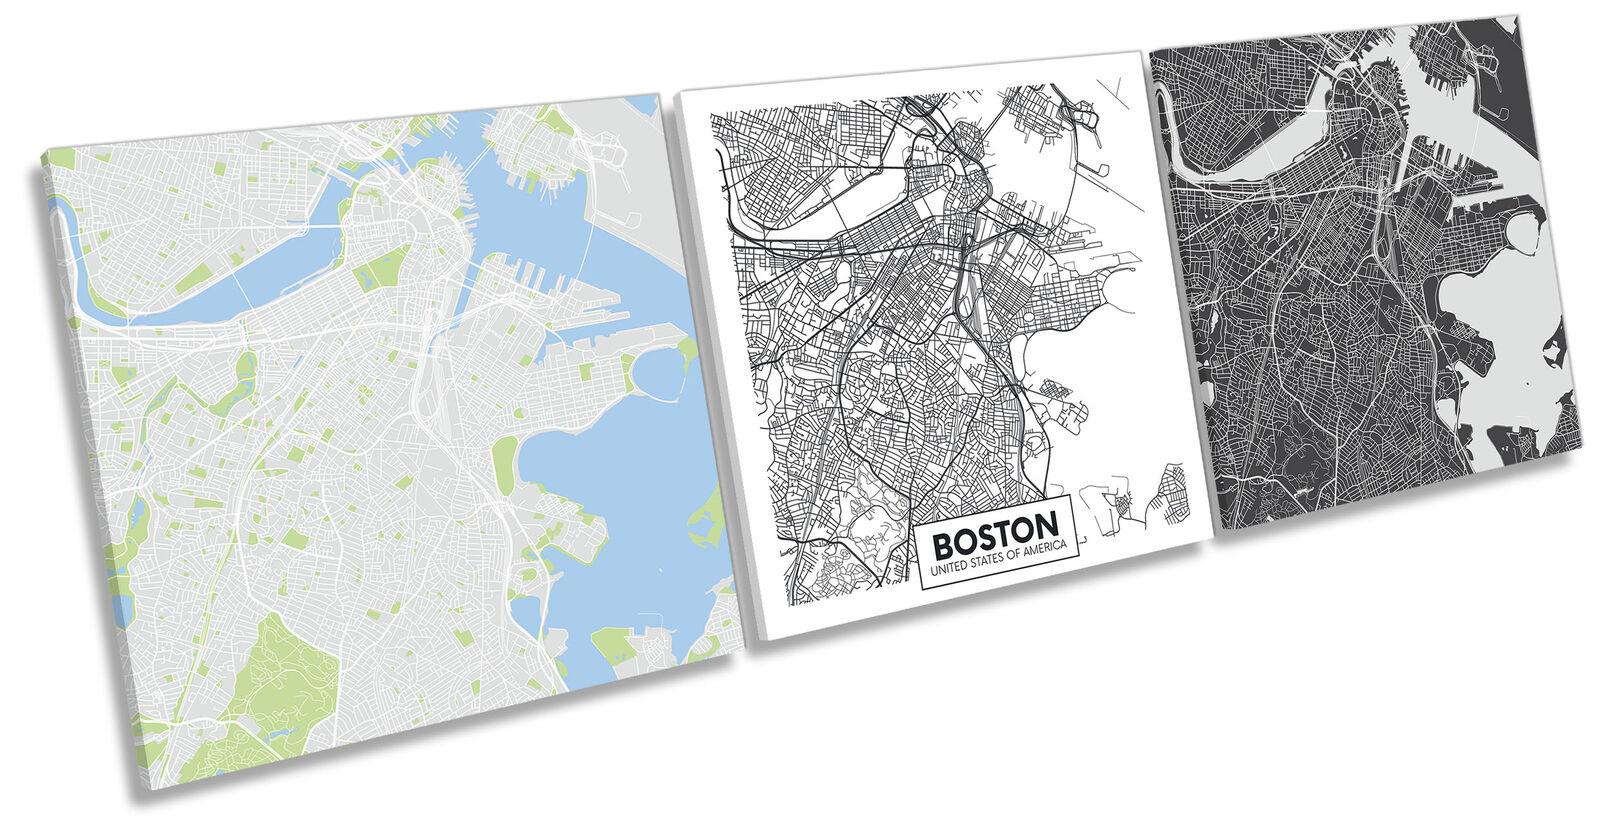 Boston US City Map Set of 3 CANVAS WALL ART Print Treble Multi-Colourot